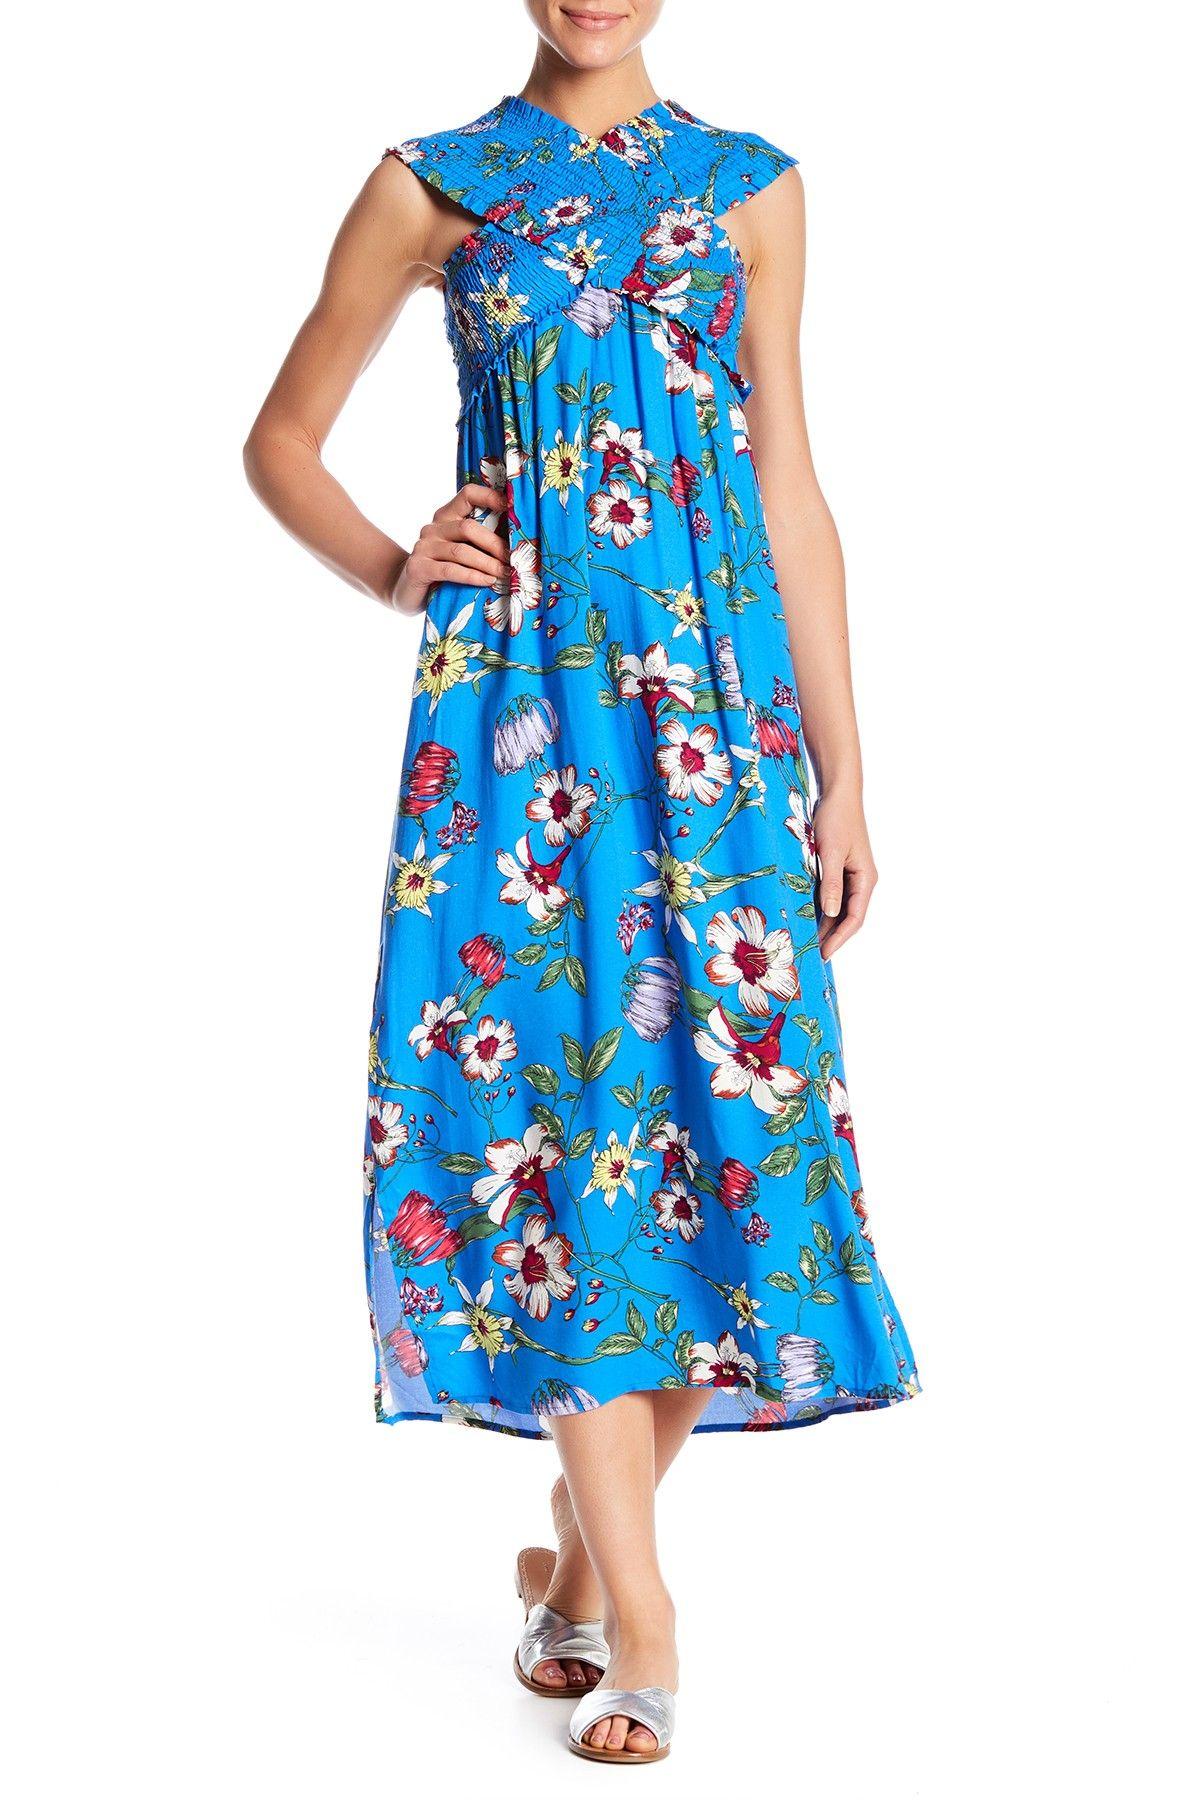 49ce4079b5497 Smocked Bodice Maxi Dress by Lush on  nordstrom rack